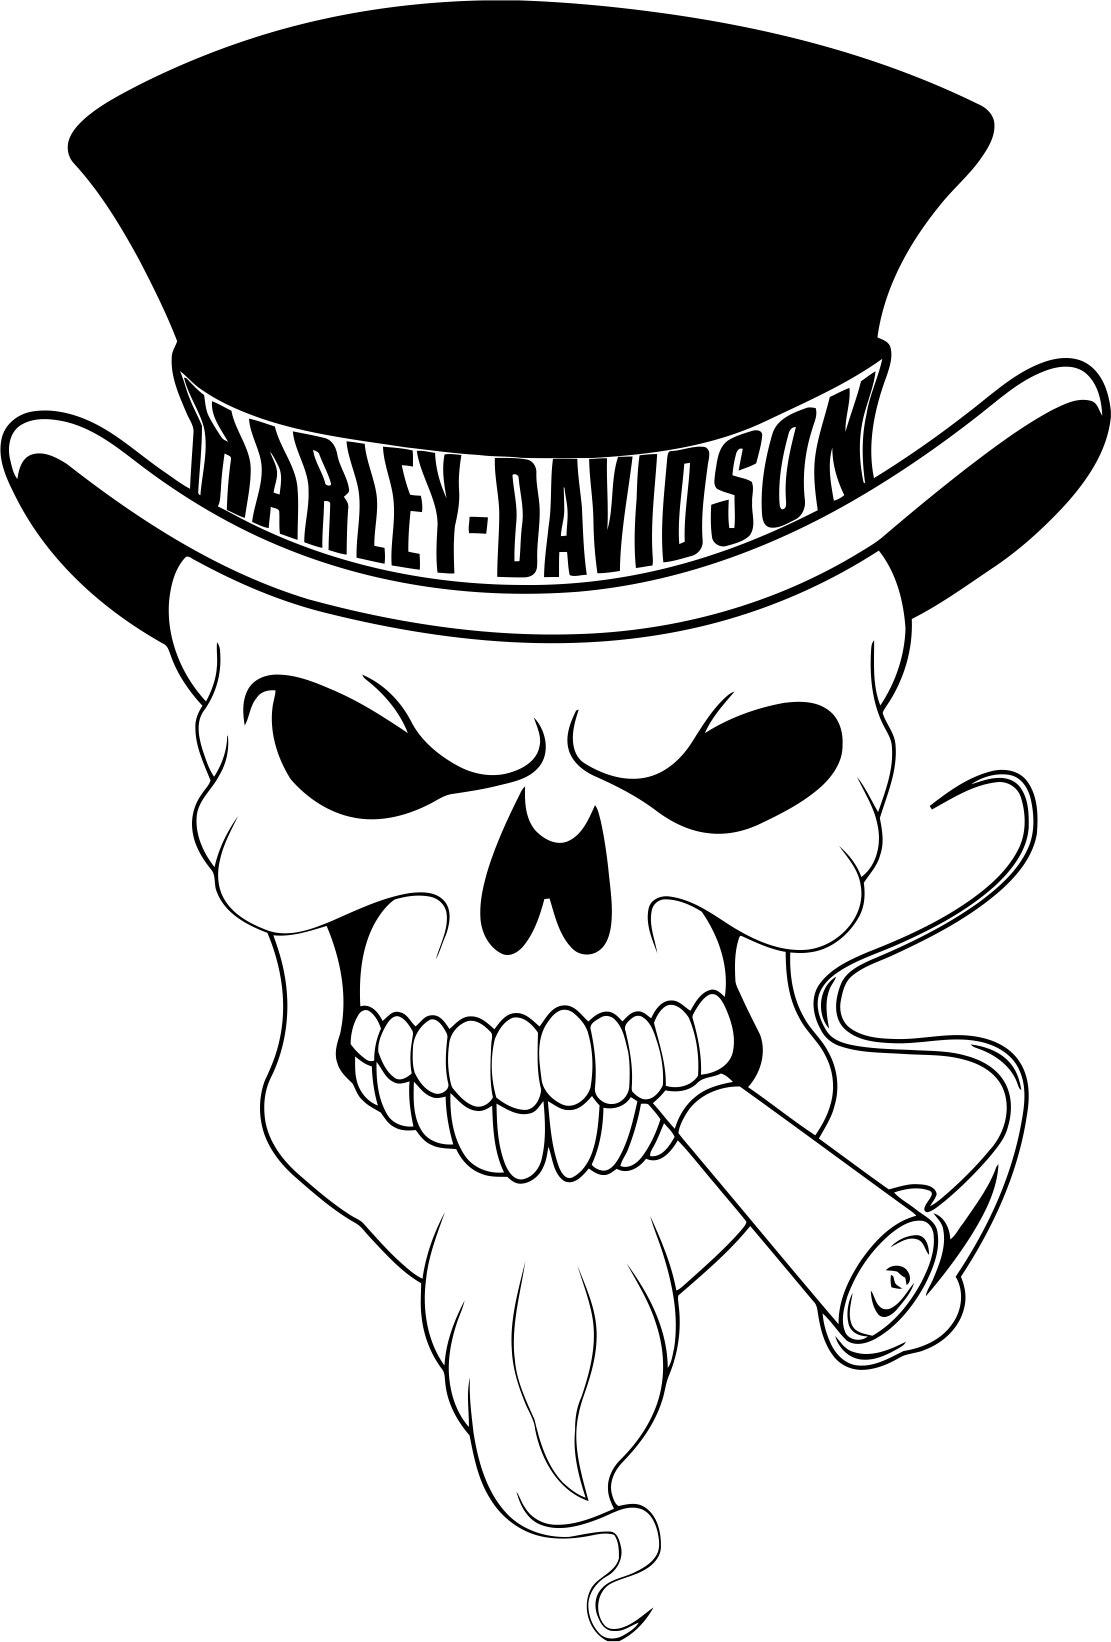 Harley Davidson Skull File Free CDR Vectors Art